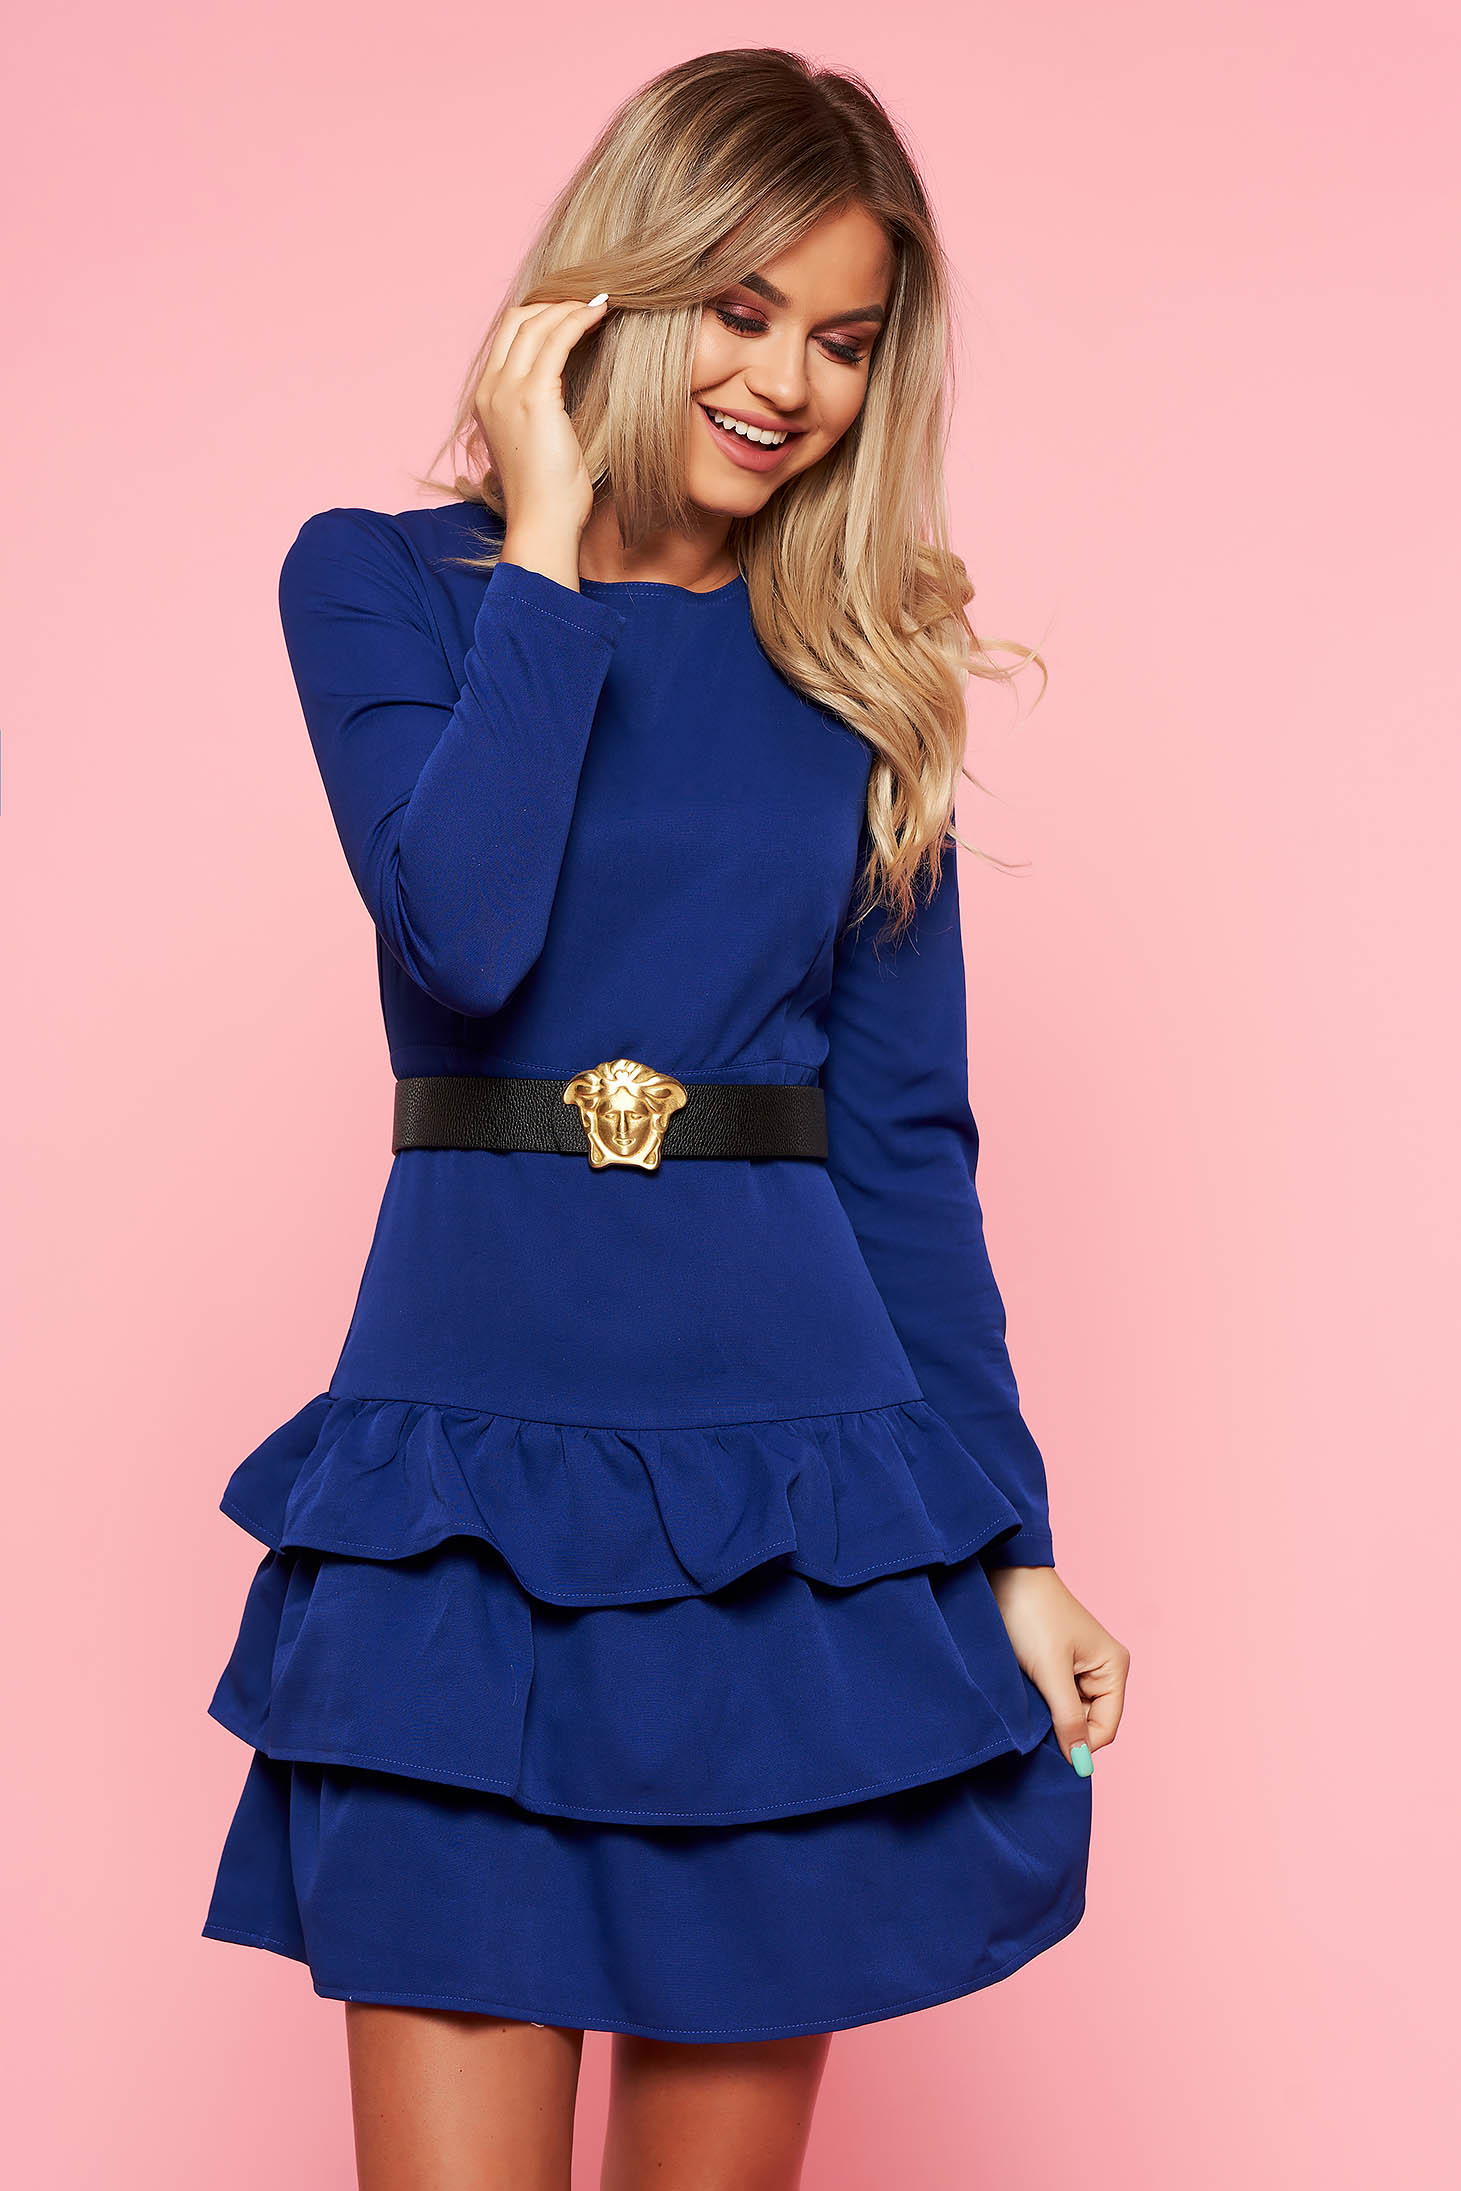 Rochie albastra de party cu un croi mulat din stofa usor elastica cu accesoriu tip curea